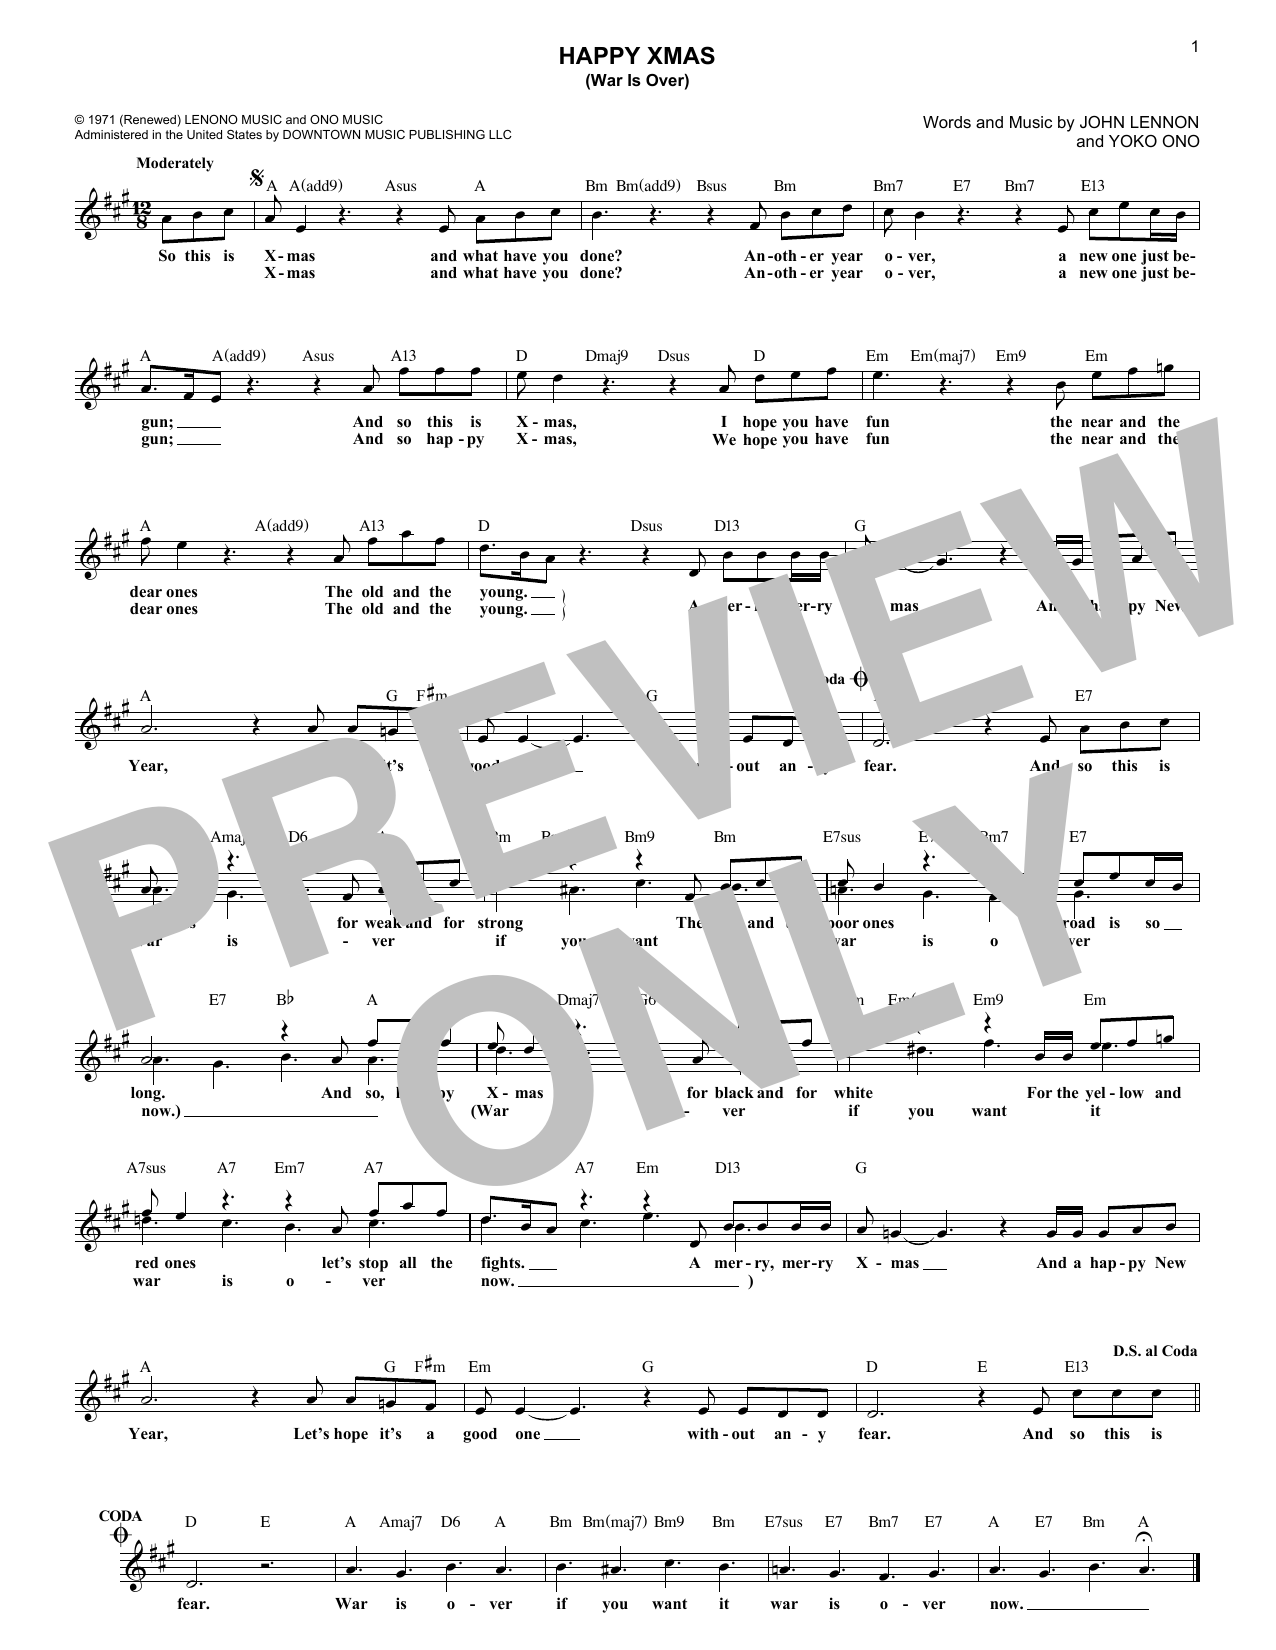 Happy Christmas War Is Over Chords.John Lennon Happy Xmas War Is Over Sheet Music Notes Chords Download Printable Melody Line Lyrics Chords Sku 184912